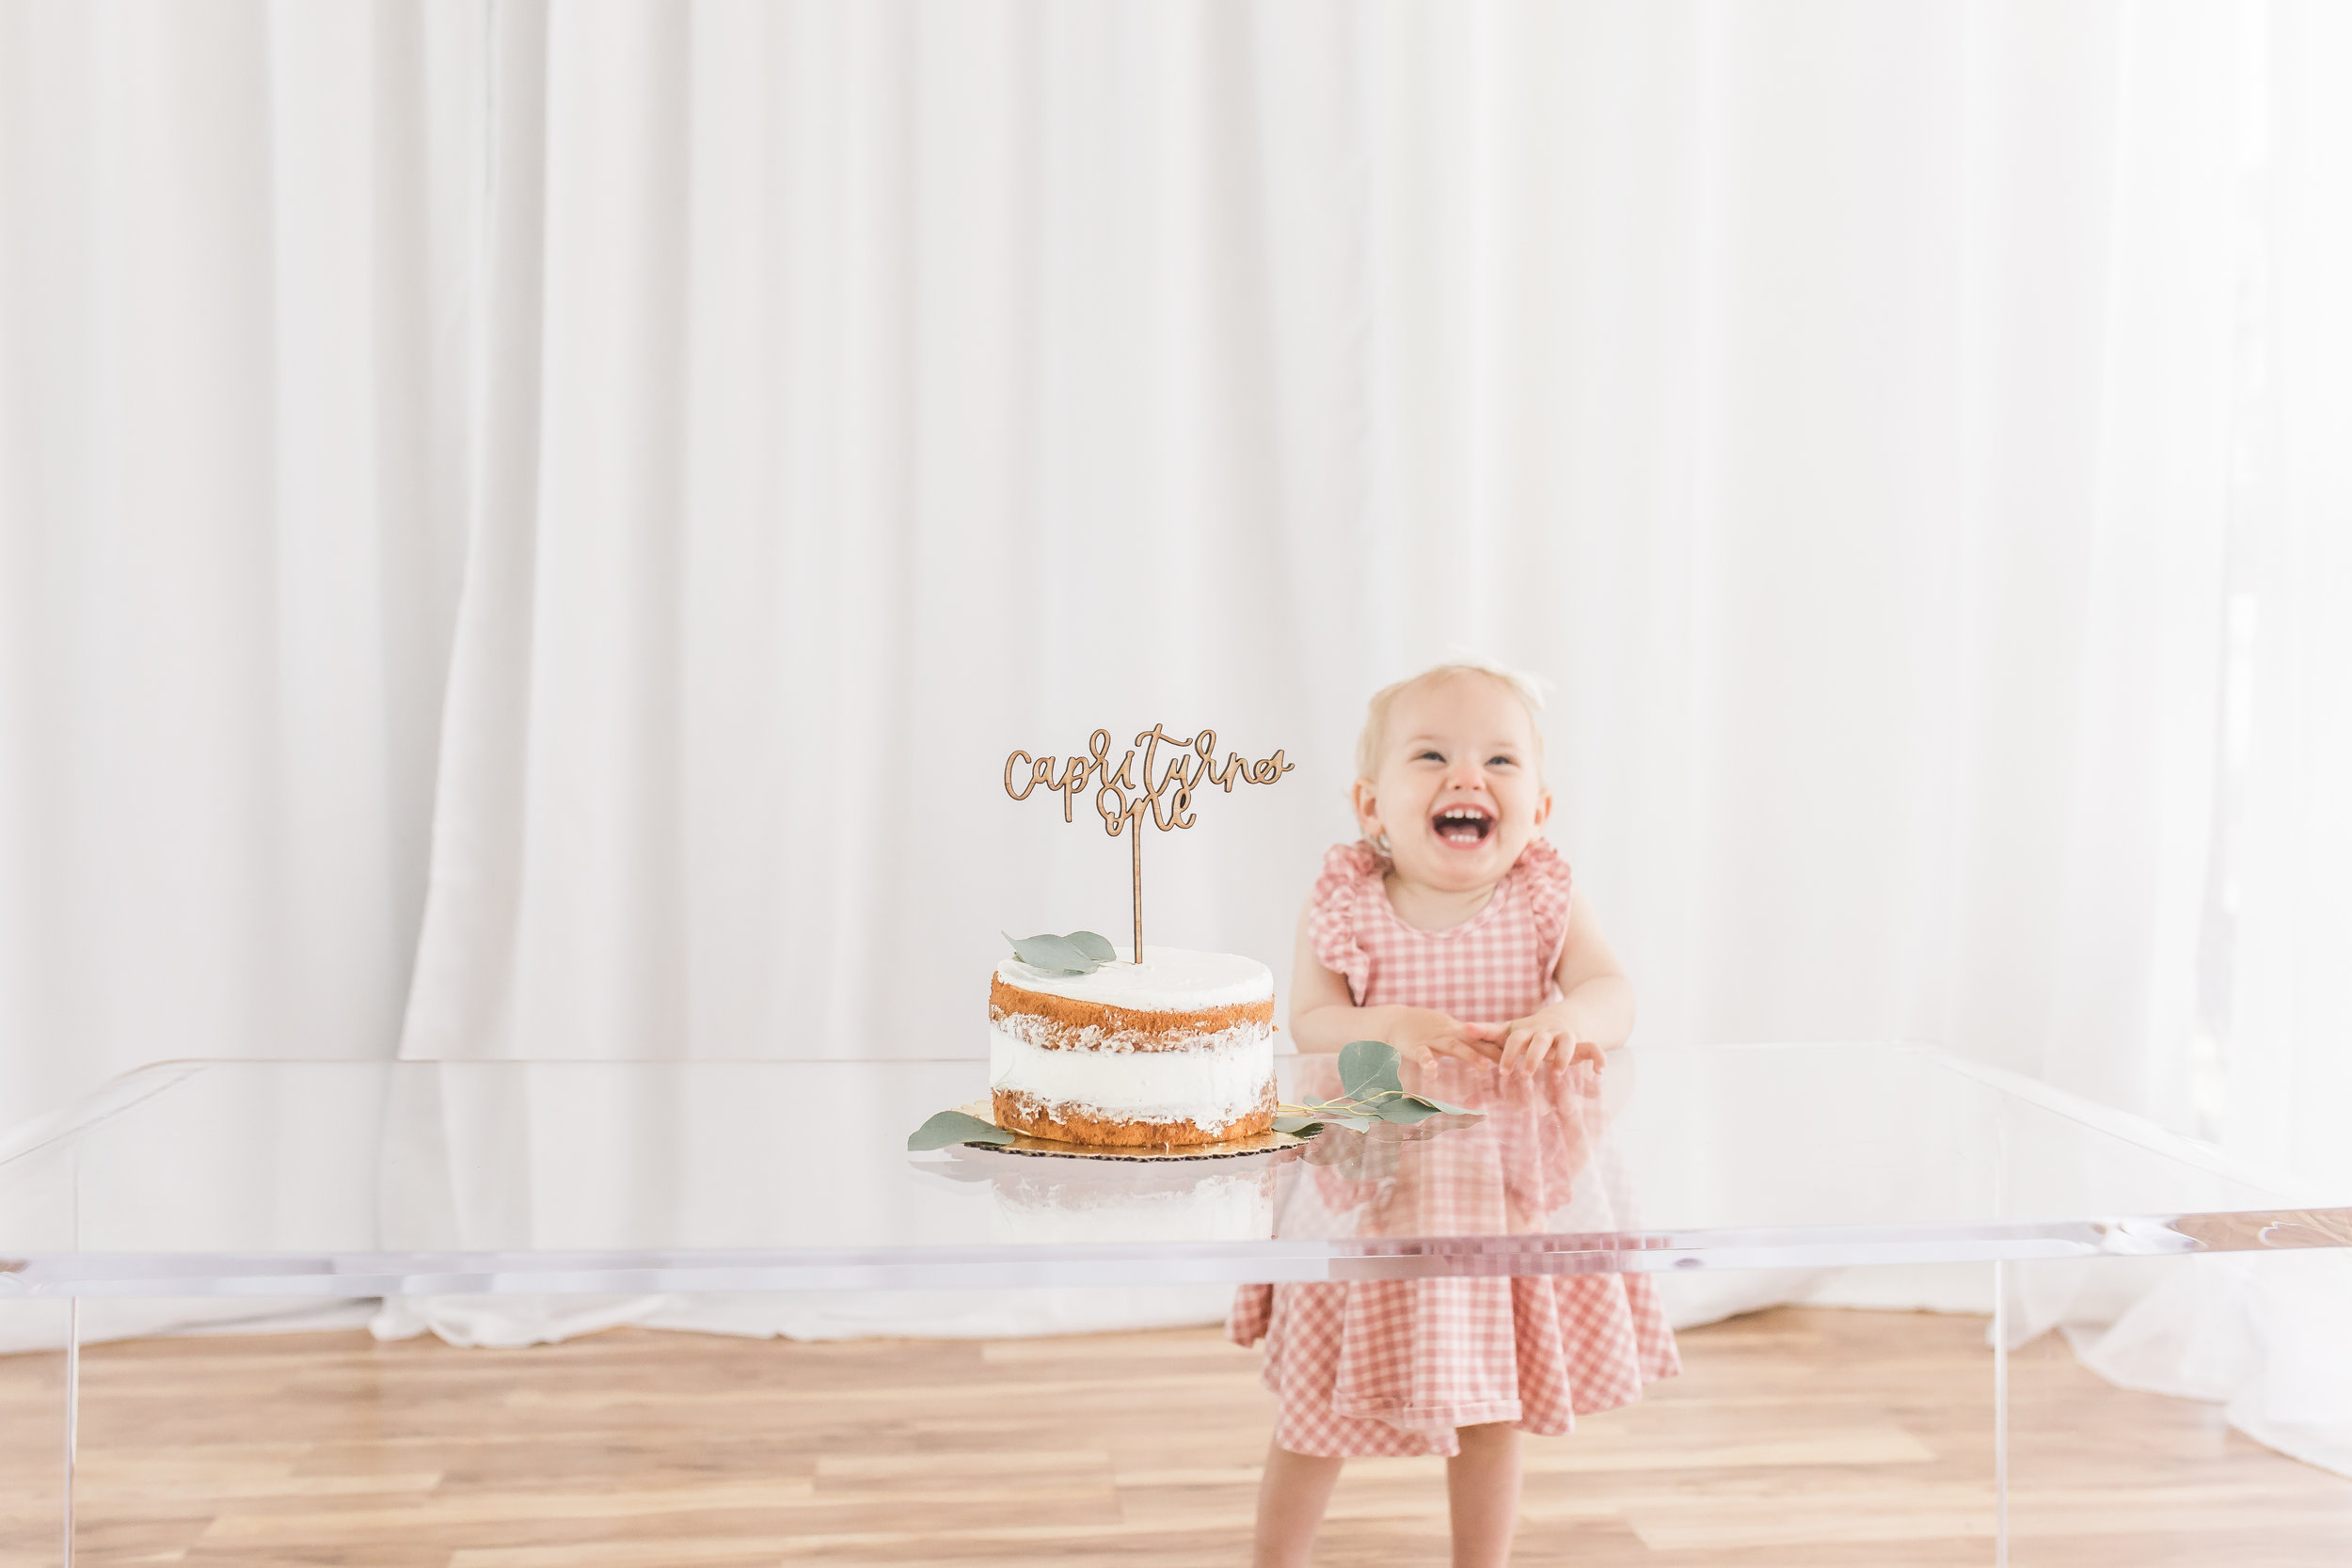 Orange County Motherhood Photographer - poppy lea photography-18.jpg